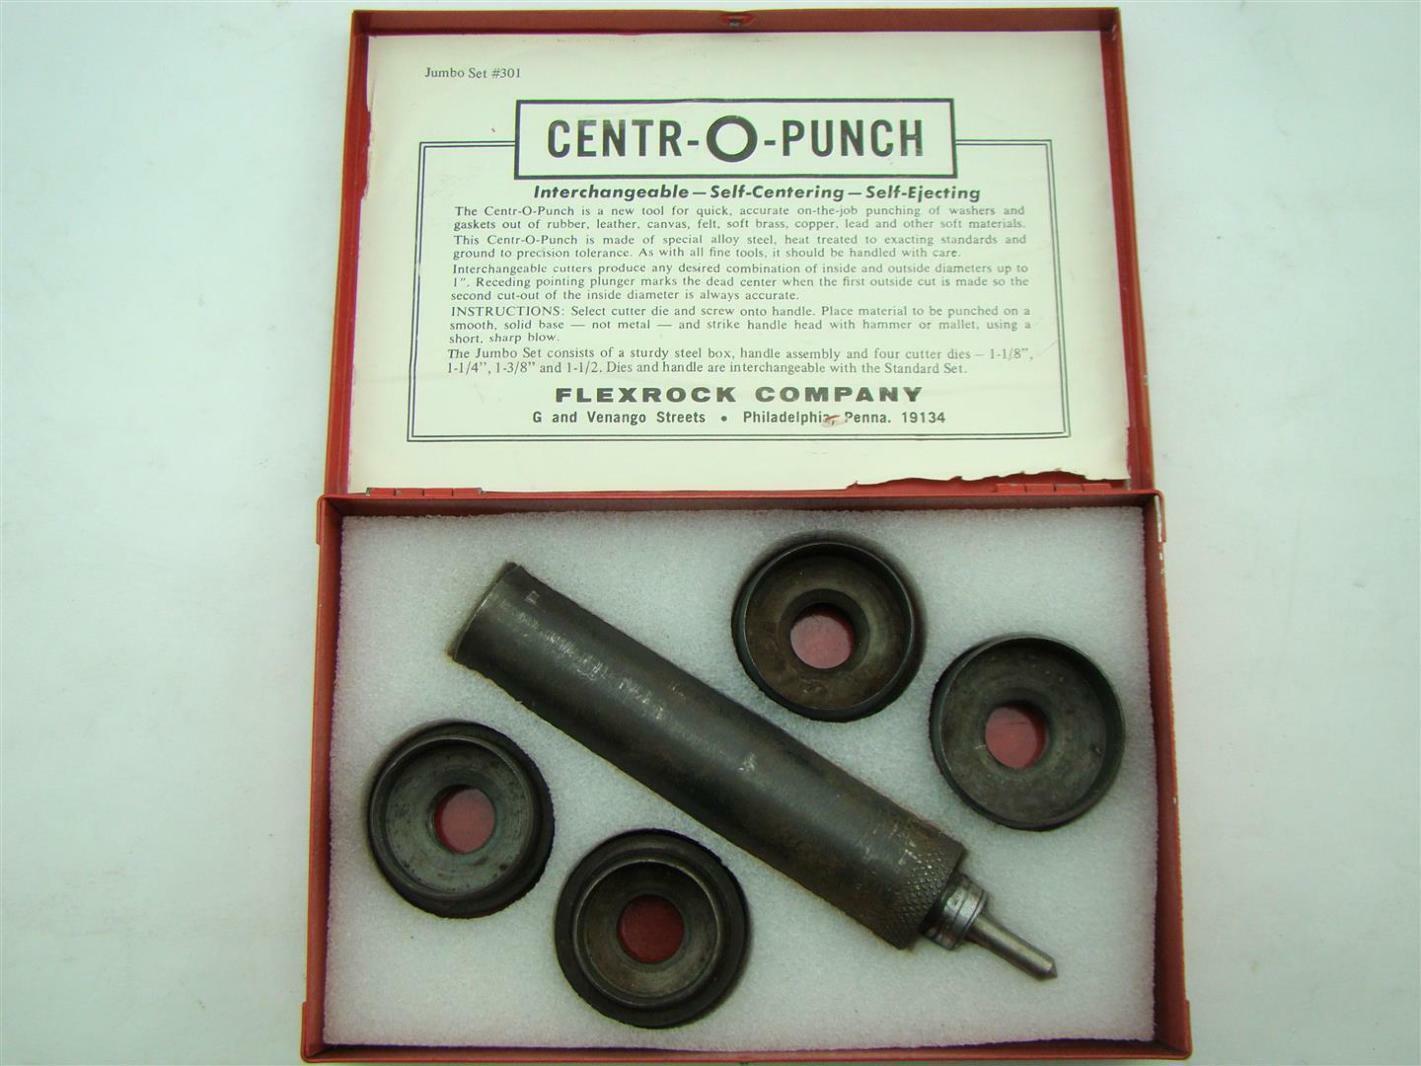 Centr-O-Punch set #301 Flexrock Co